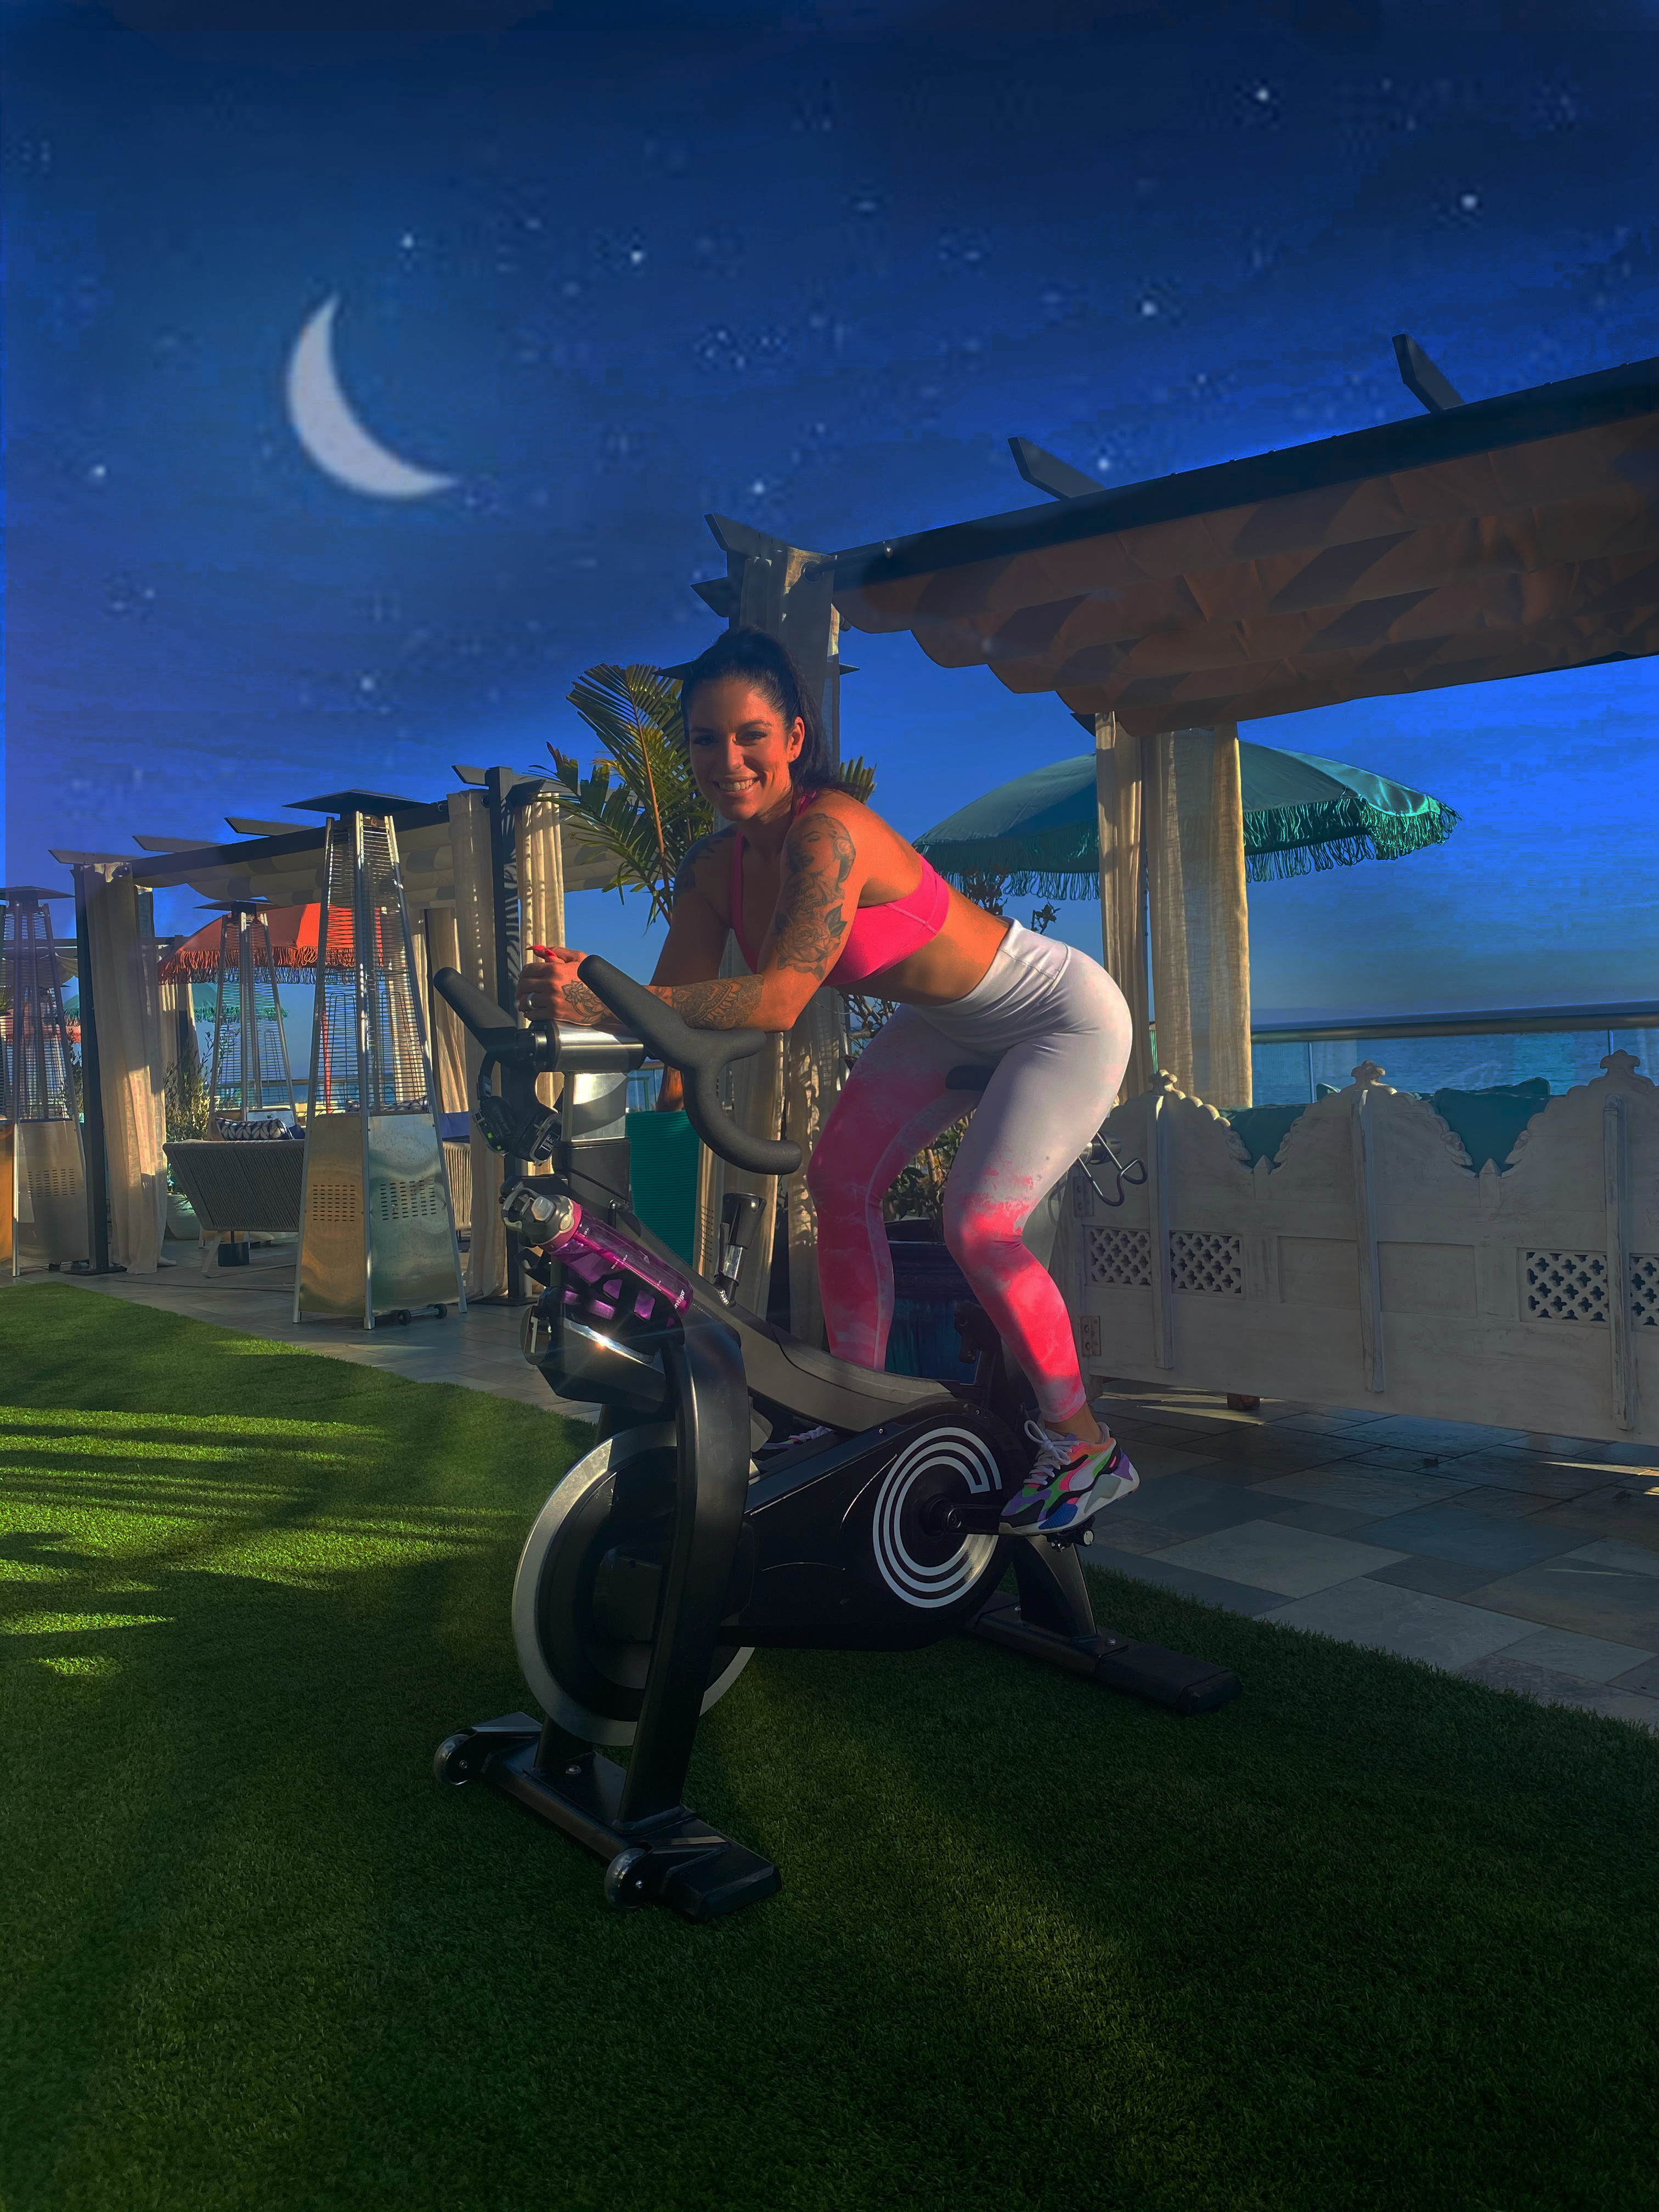 Live DJ Cycling Ride Into The Night